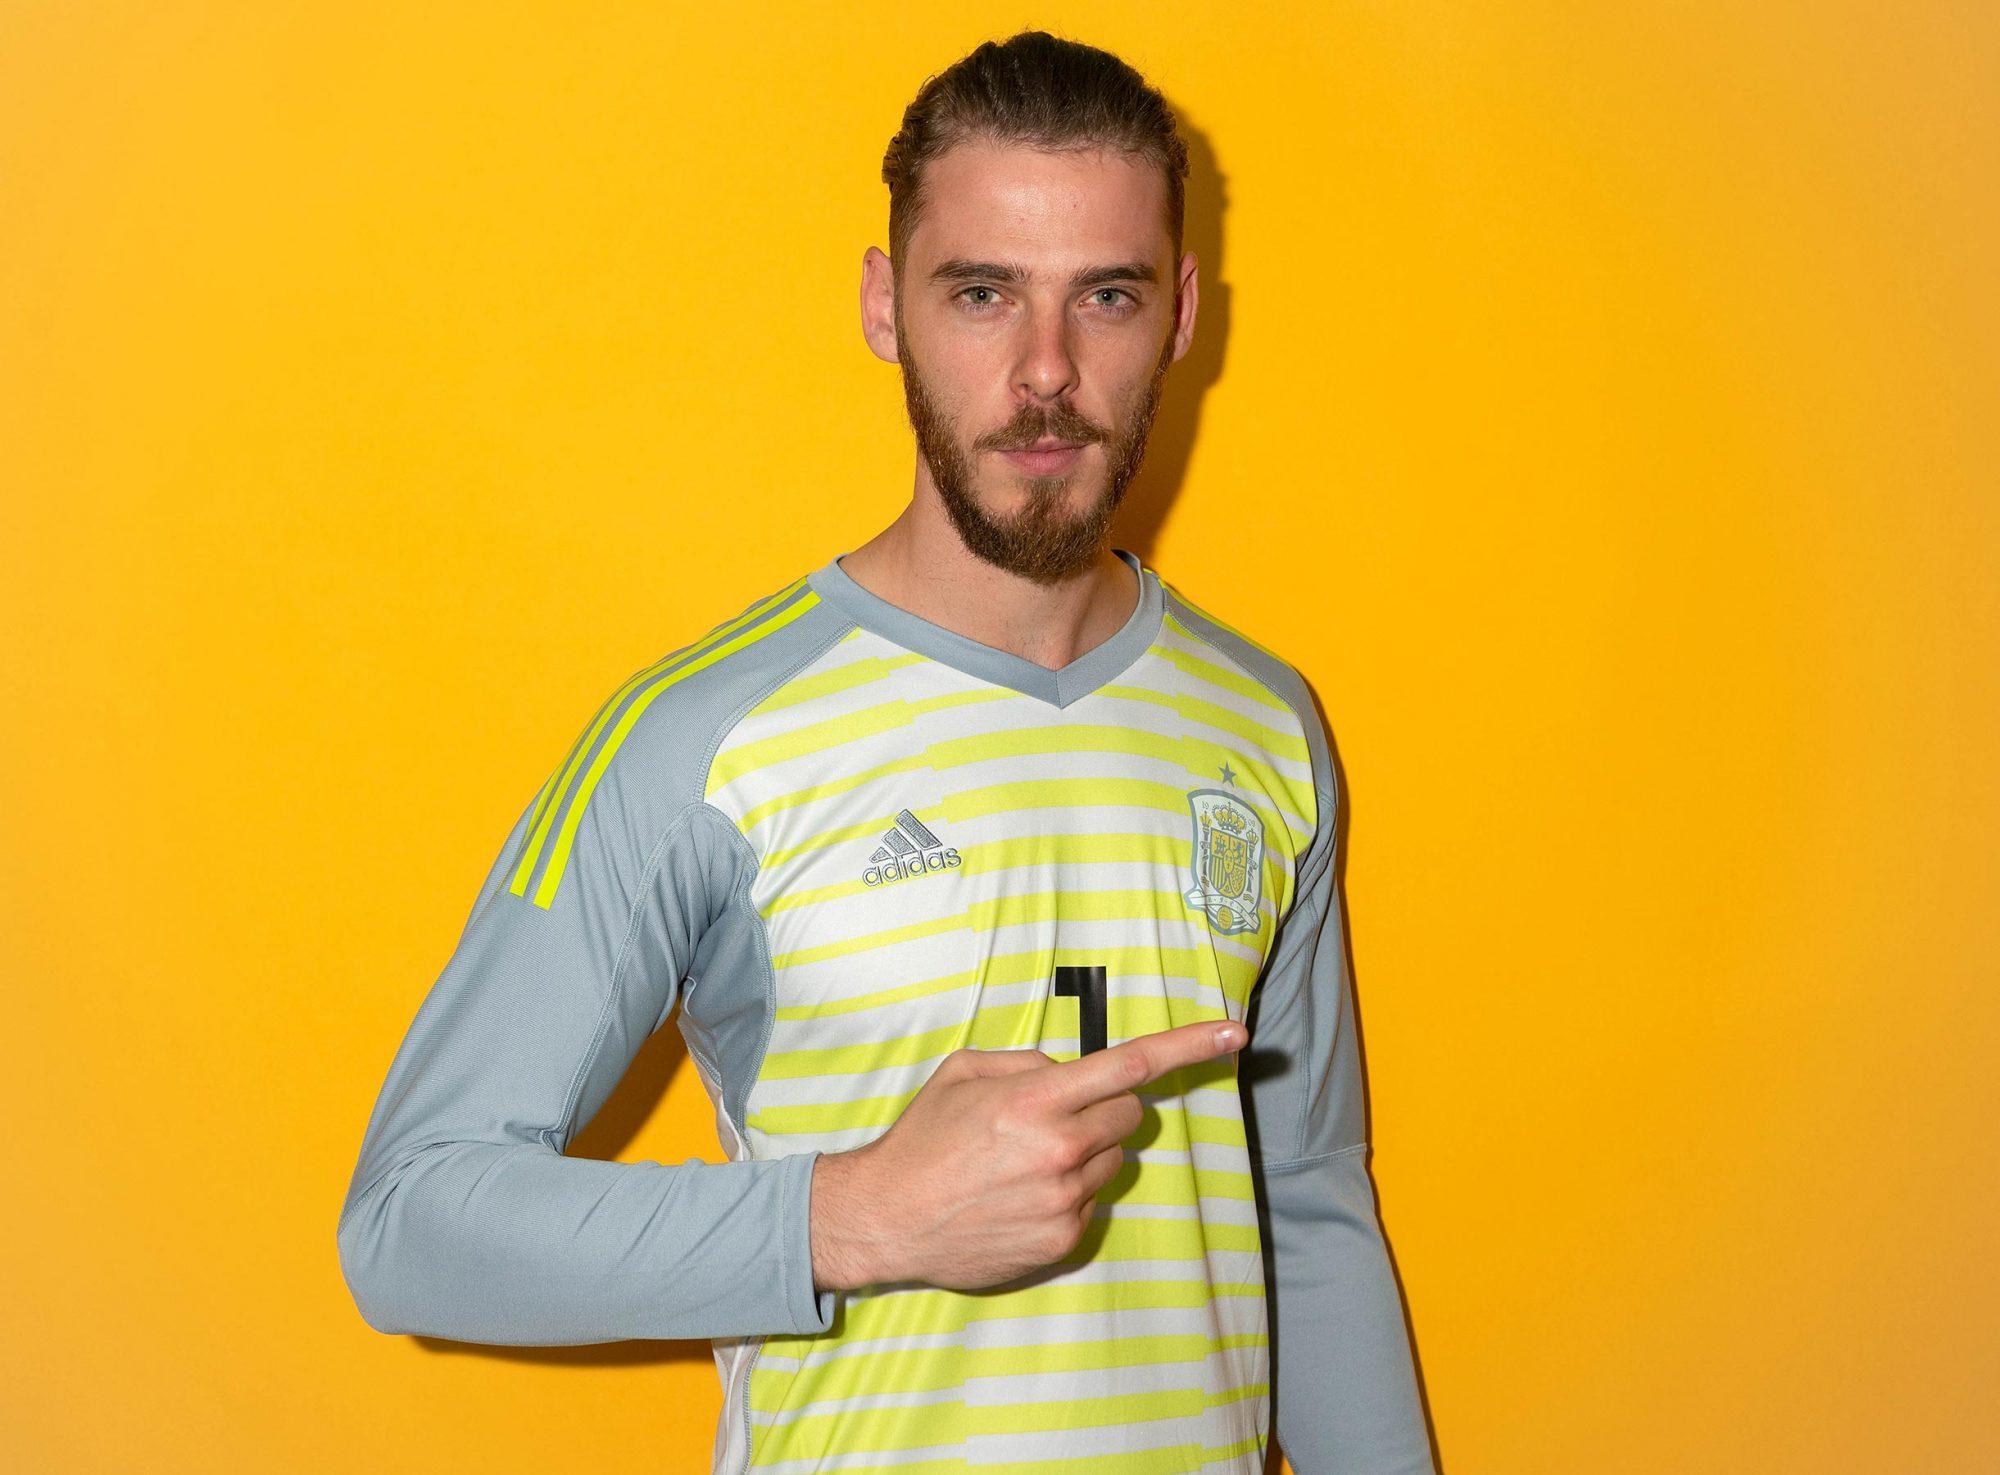 Spain Portraits - 2018 FIFA World Cup Russia